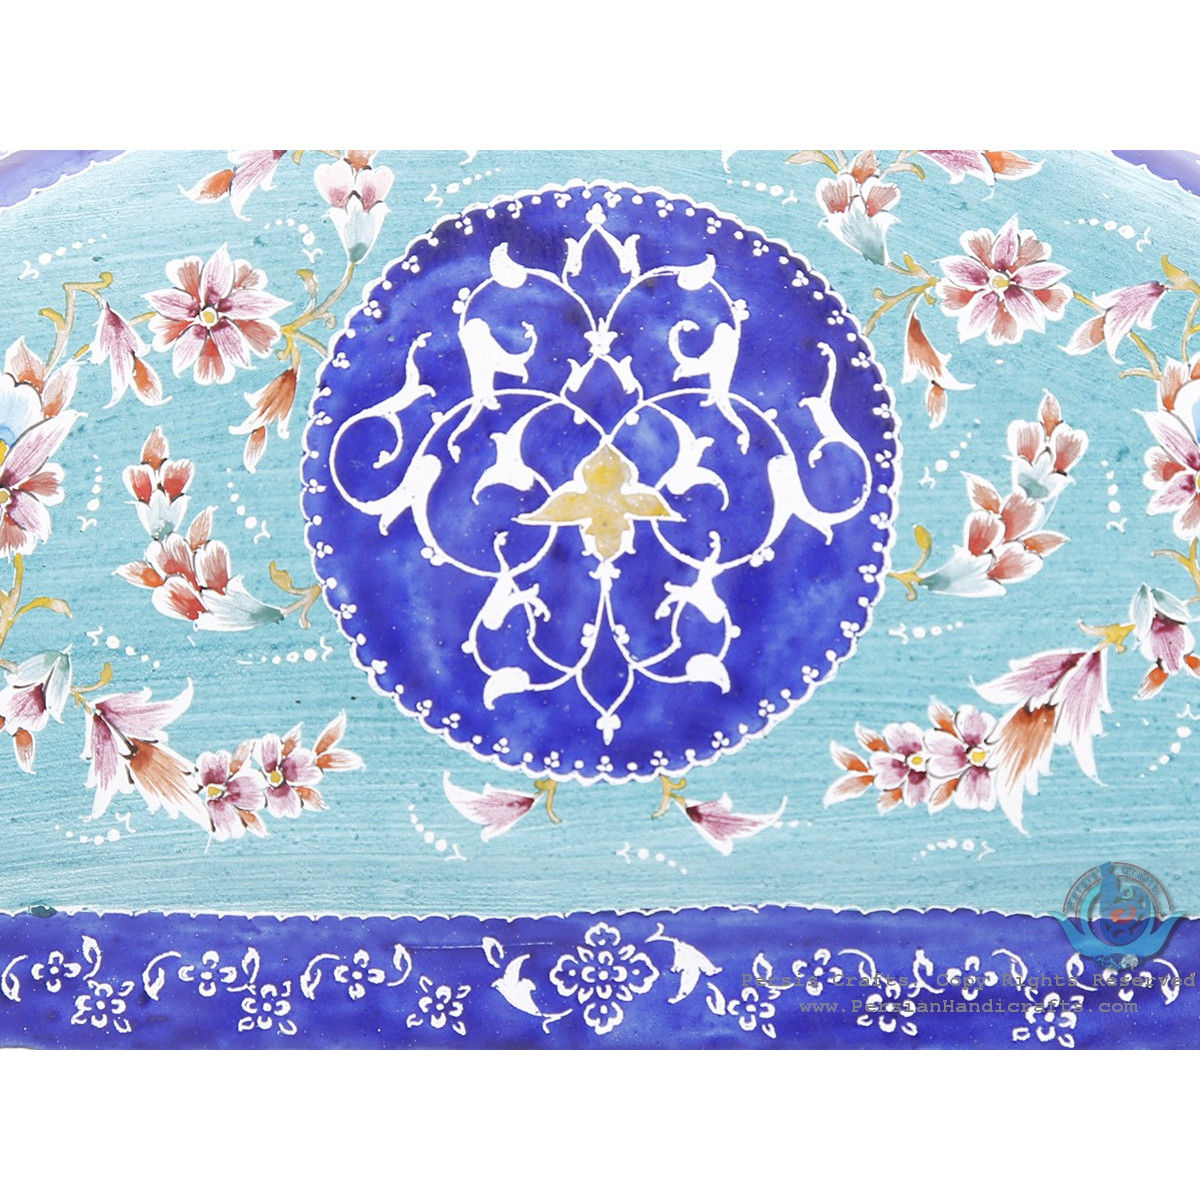 Classy Enamel Eslimi Design Minakari Wall Mirror - HE3921-Persian Handicrafts